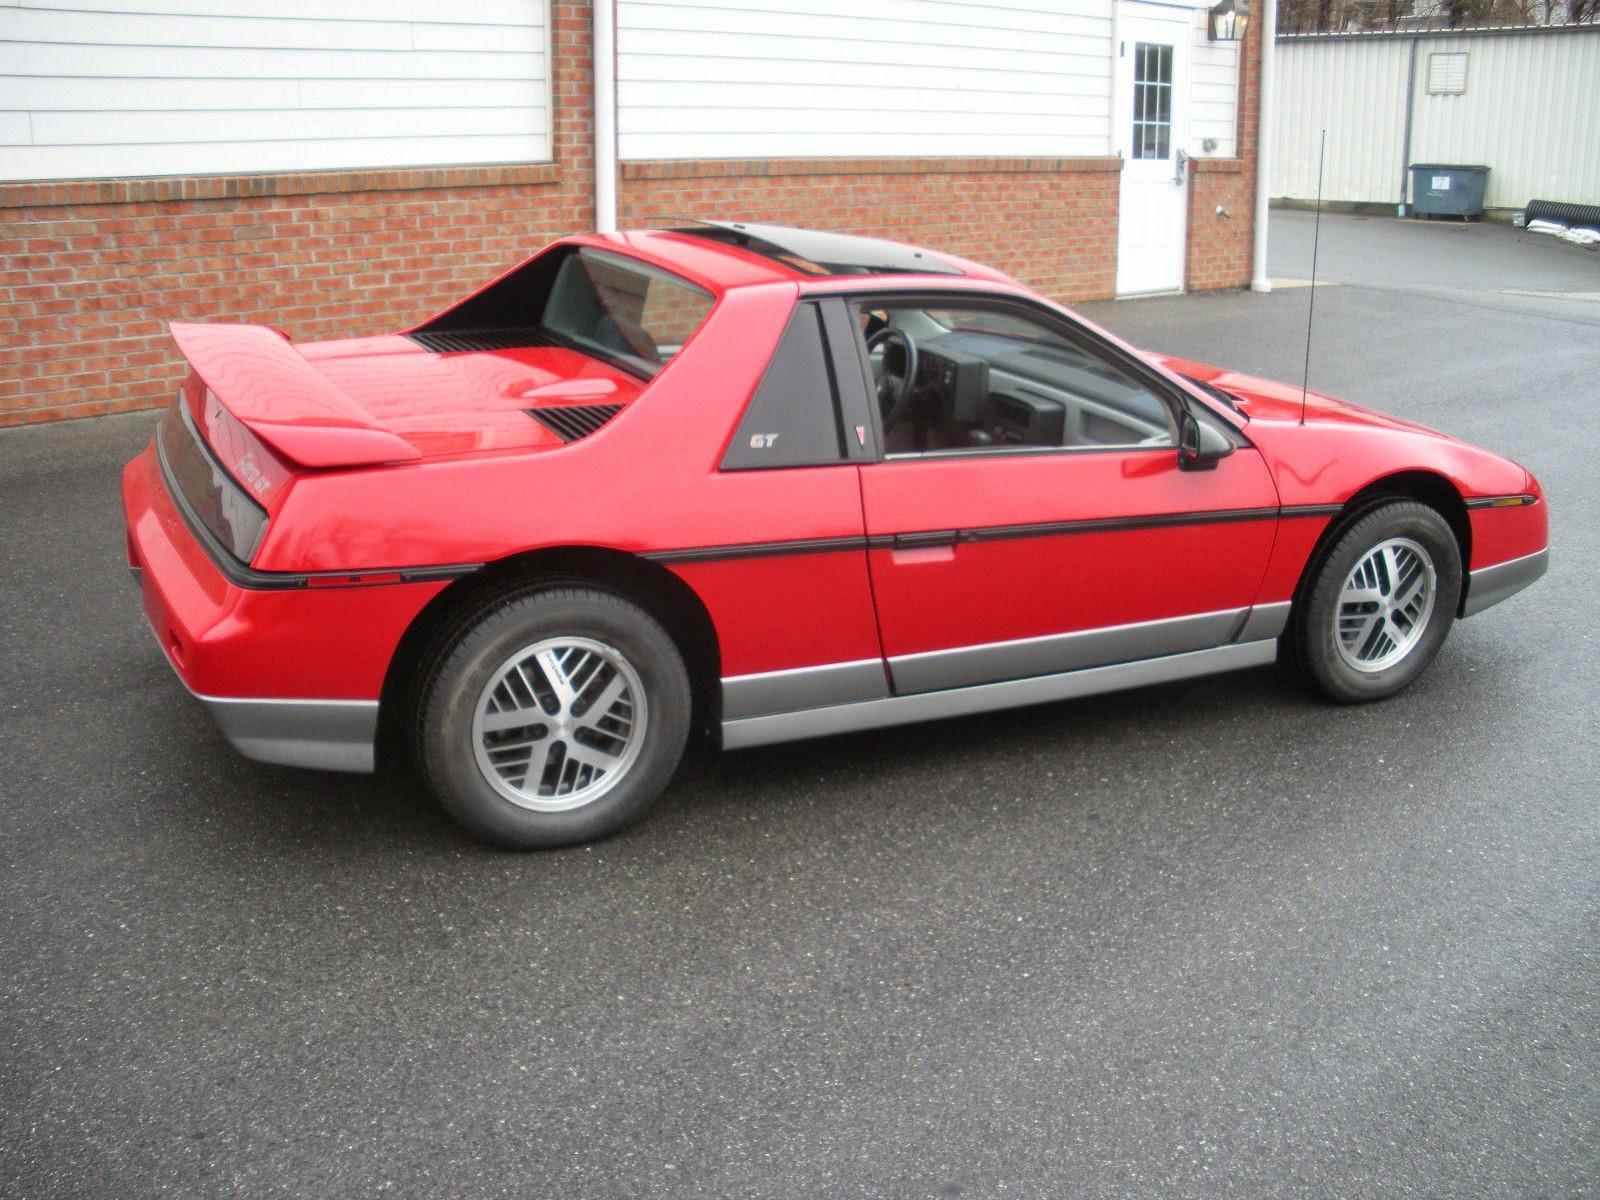 All American Classic Cars: 1985 Pontiac Fiero GT 2-Door Fastback